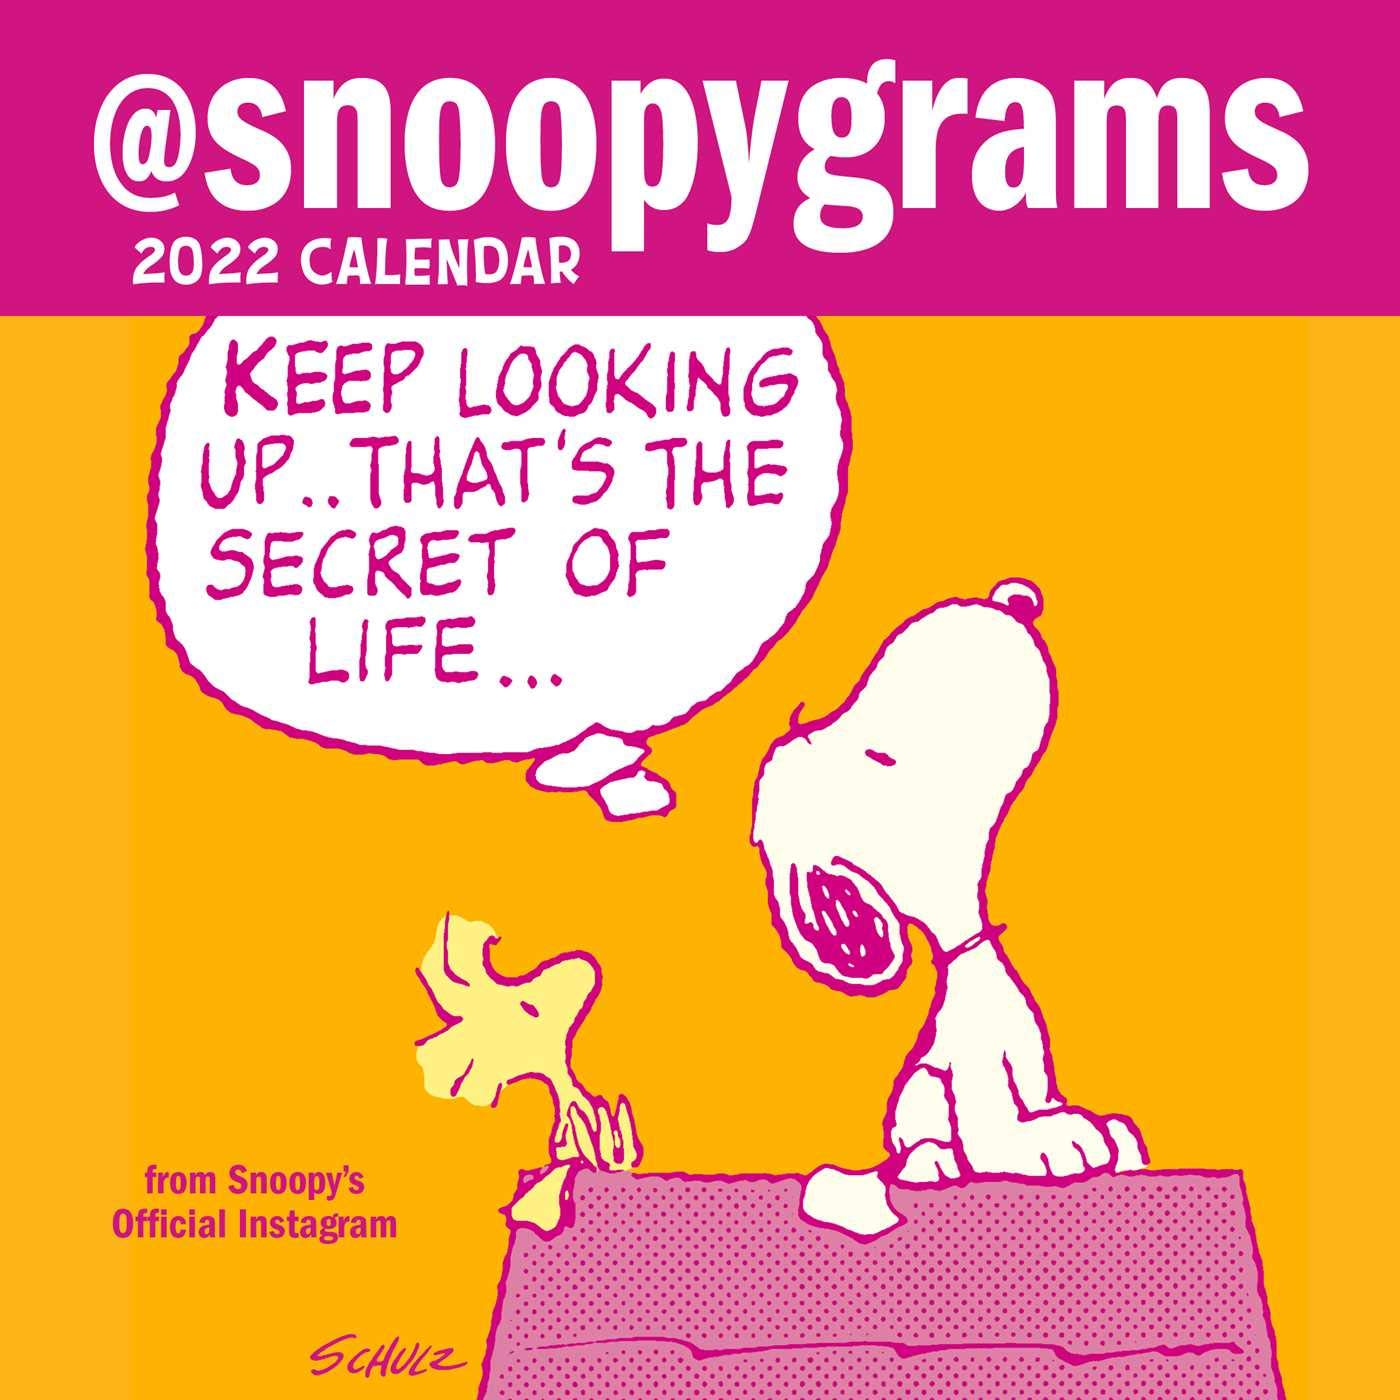 Mini 2022 Calendar.Buy Peanuts 2022 Mini Wall Calendar Snoopygrams Book Online At Low Prices In India Peanuts 2022 Mini Wall Calendar Snoopygrams Reviews Ratings Amazon In